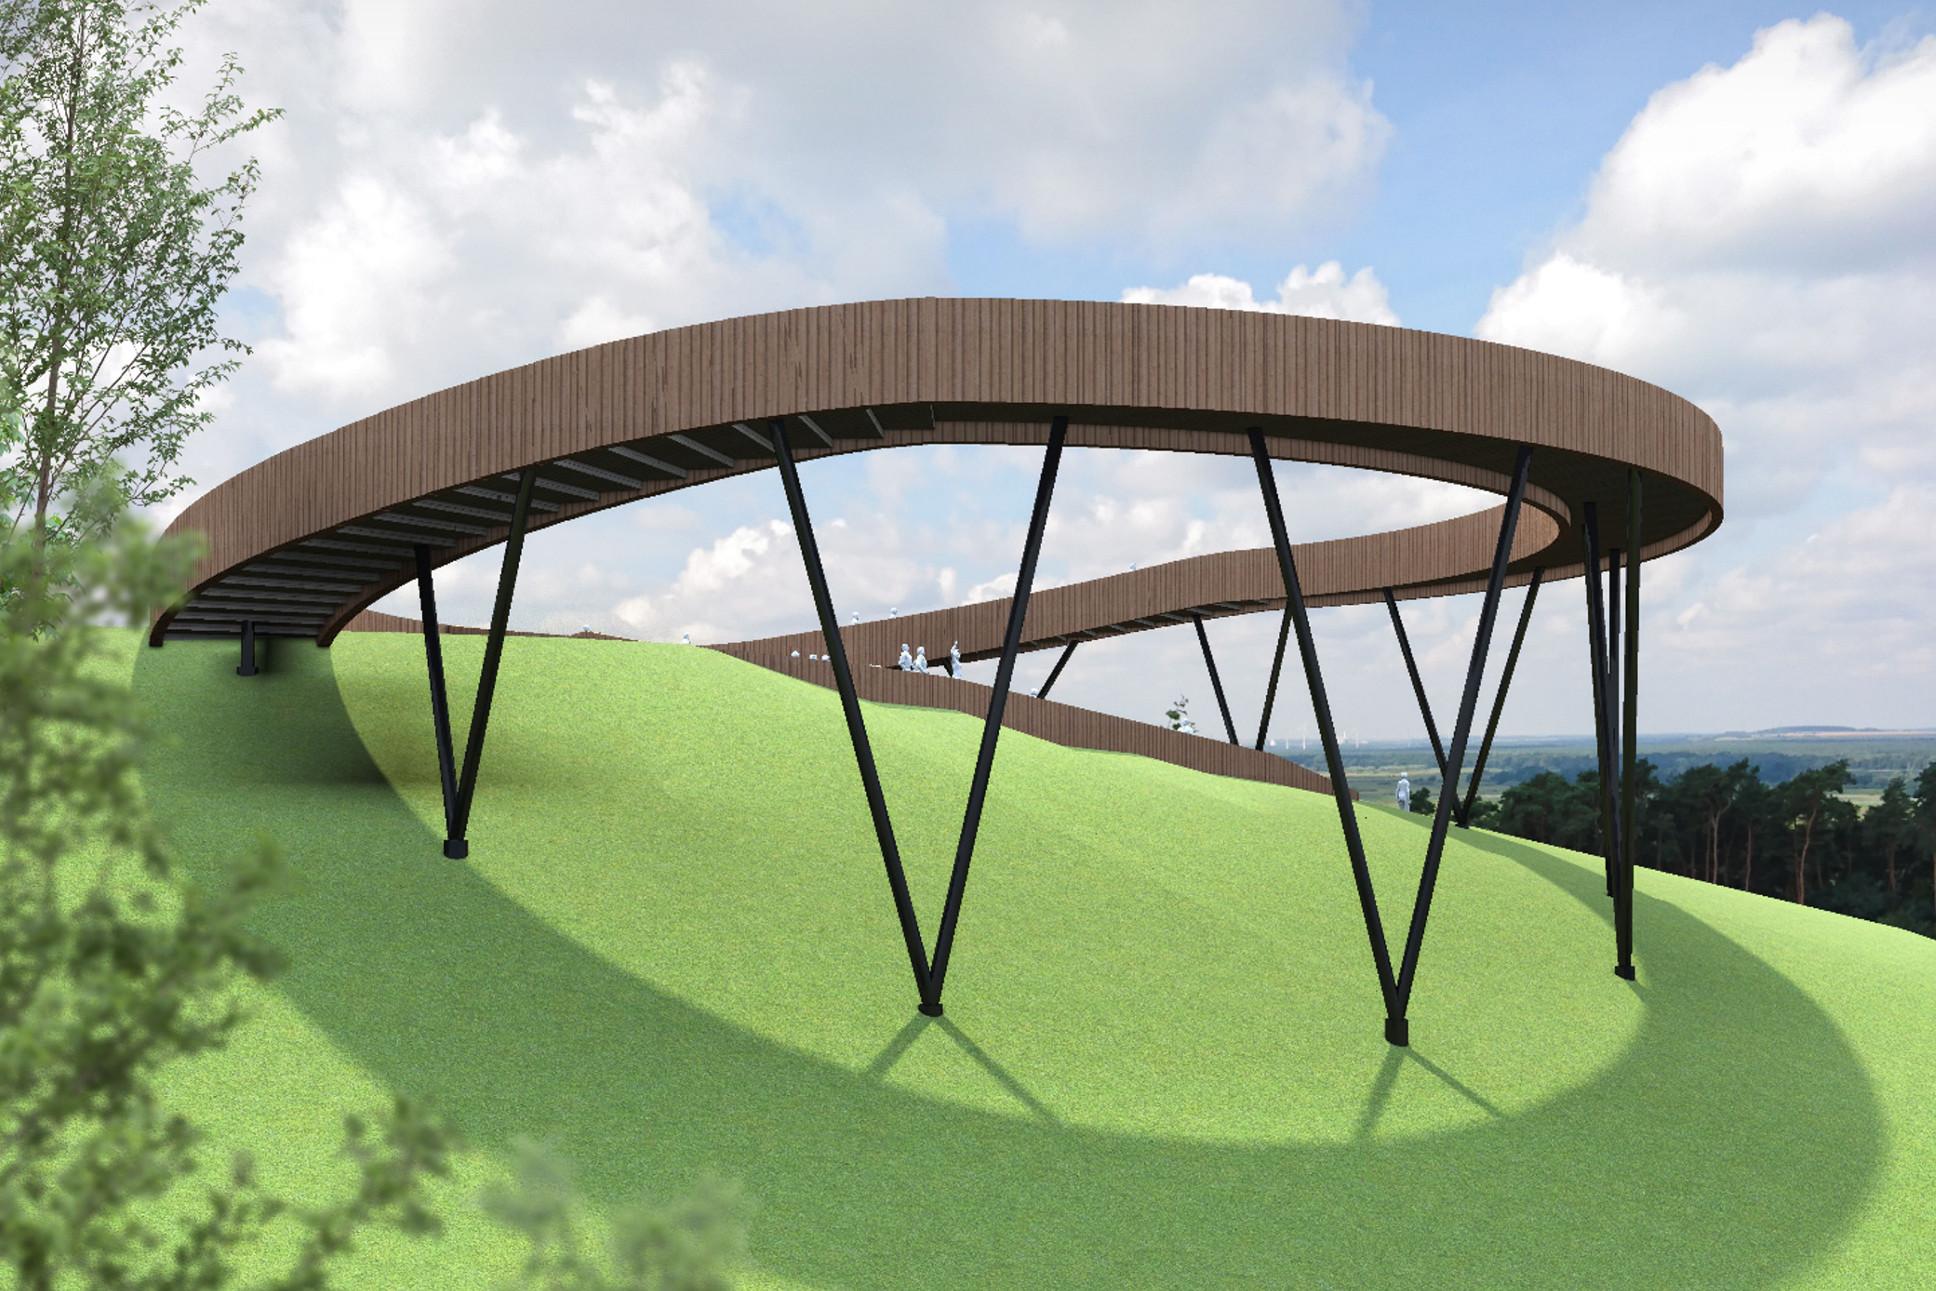 platforma widokowa Widuchowa